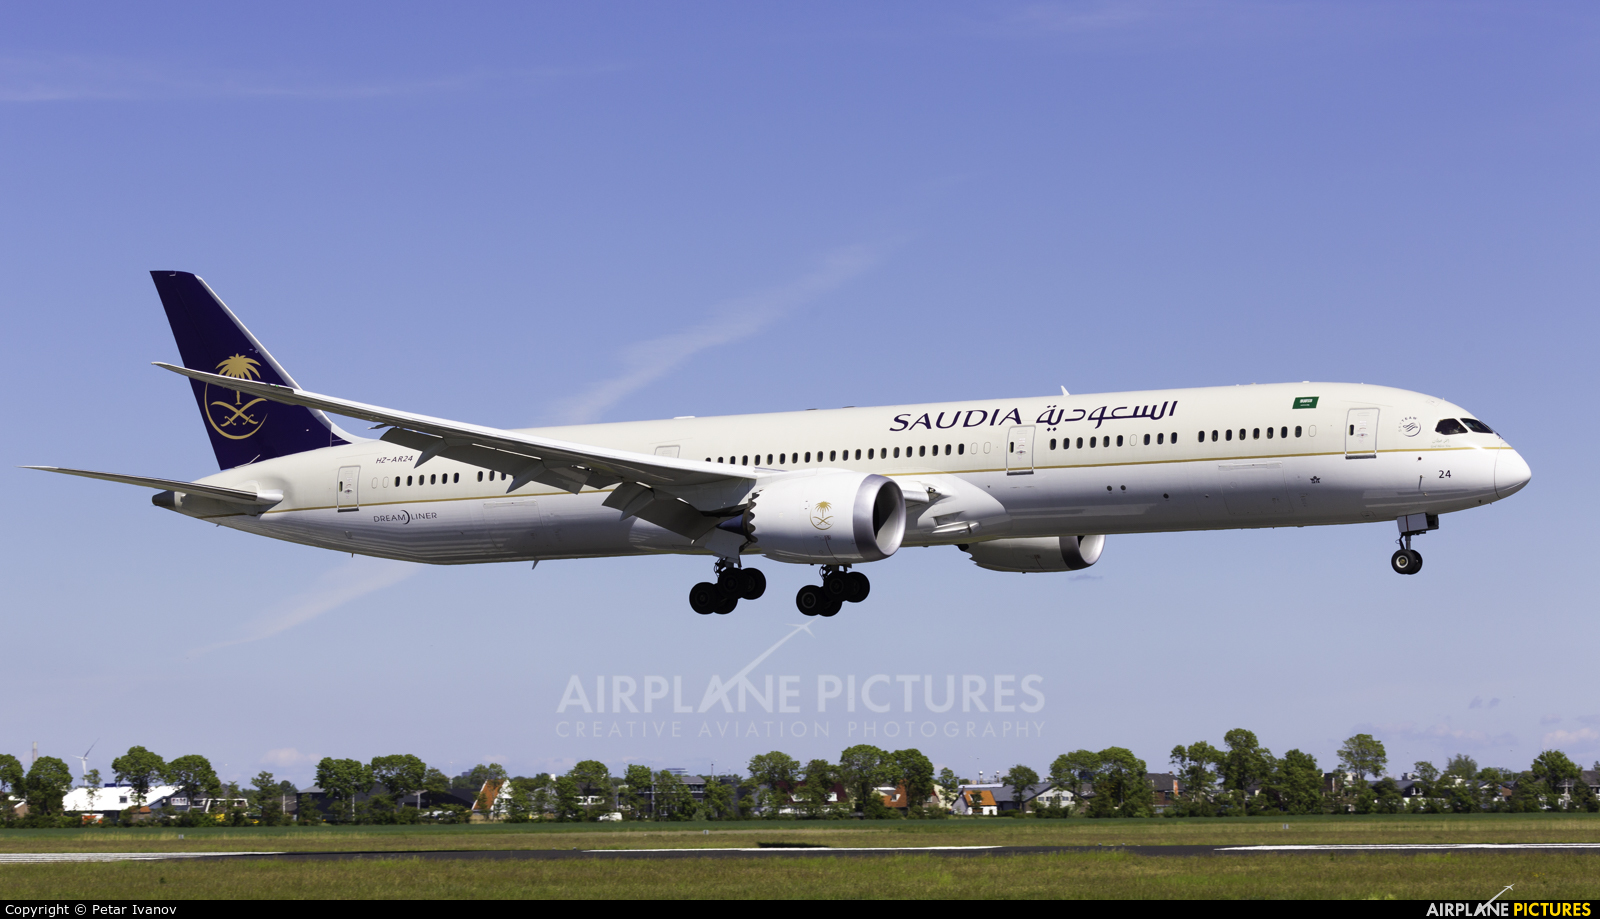 Saudi Arabian Airlines HZ-AR24 aircraft at Amsterdam - Schiphol